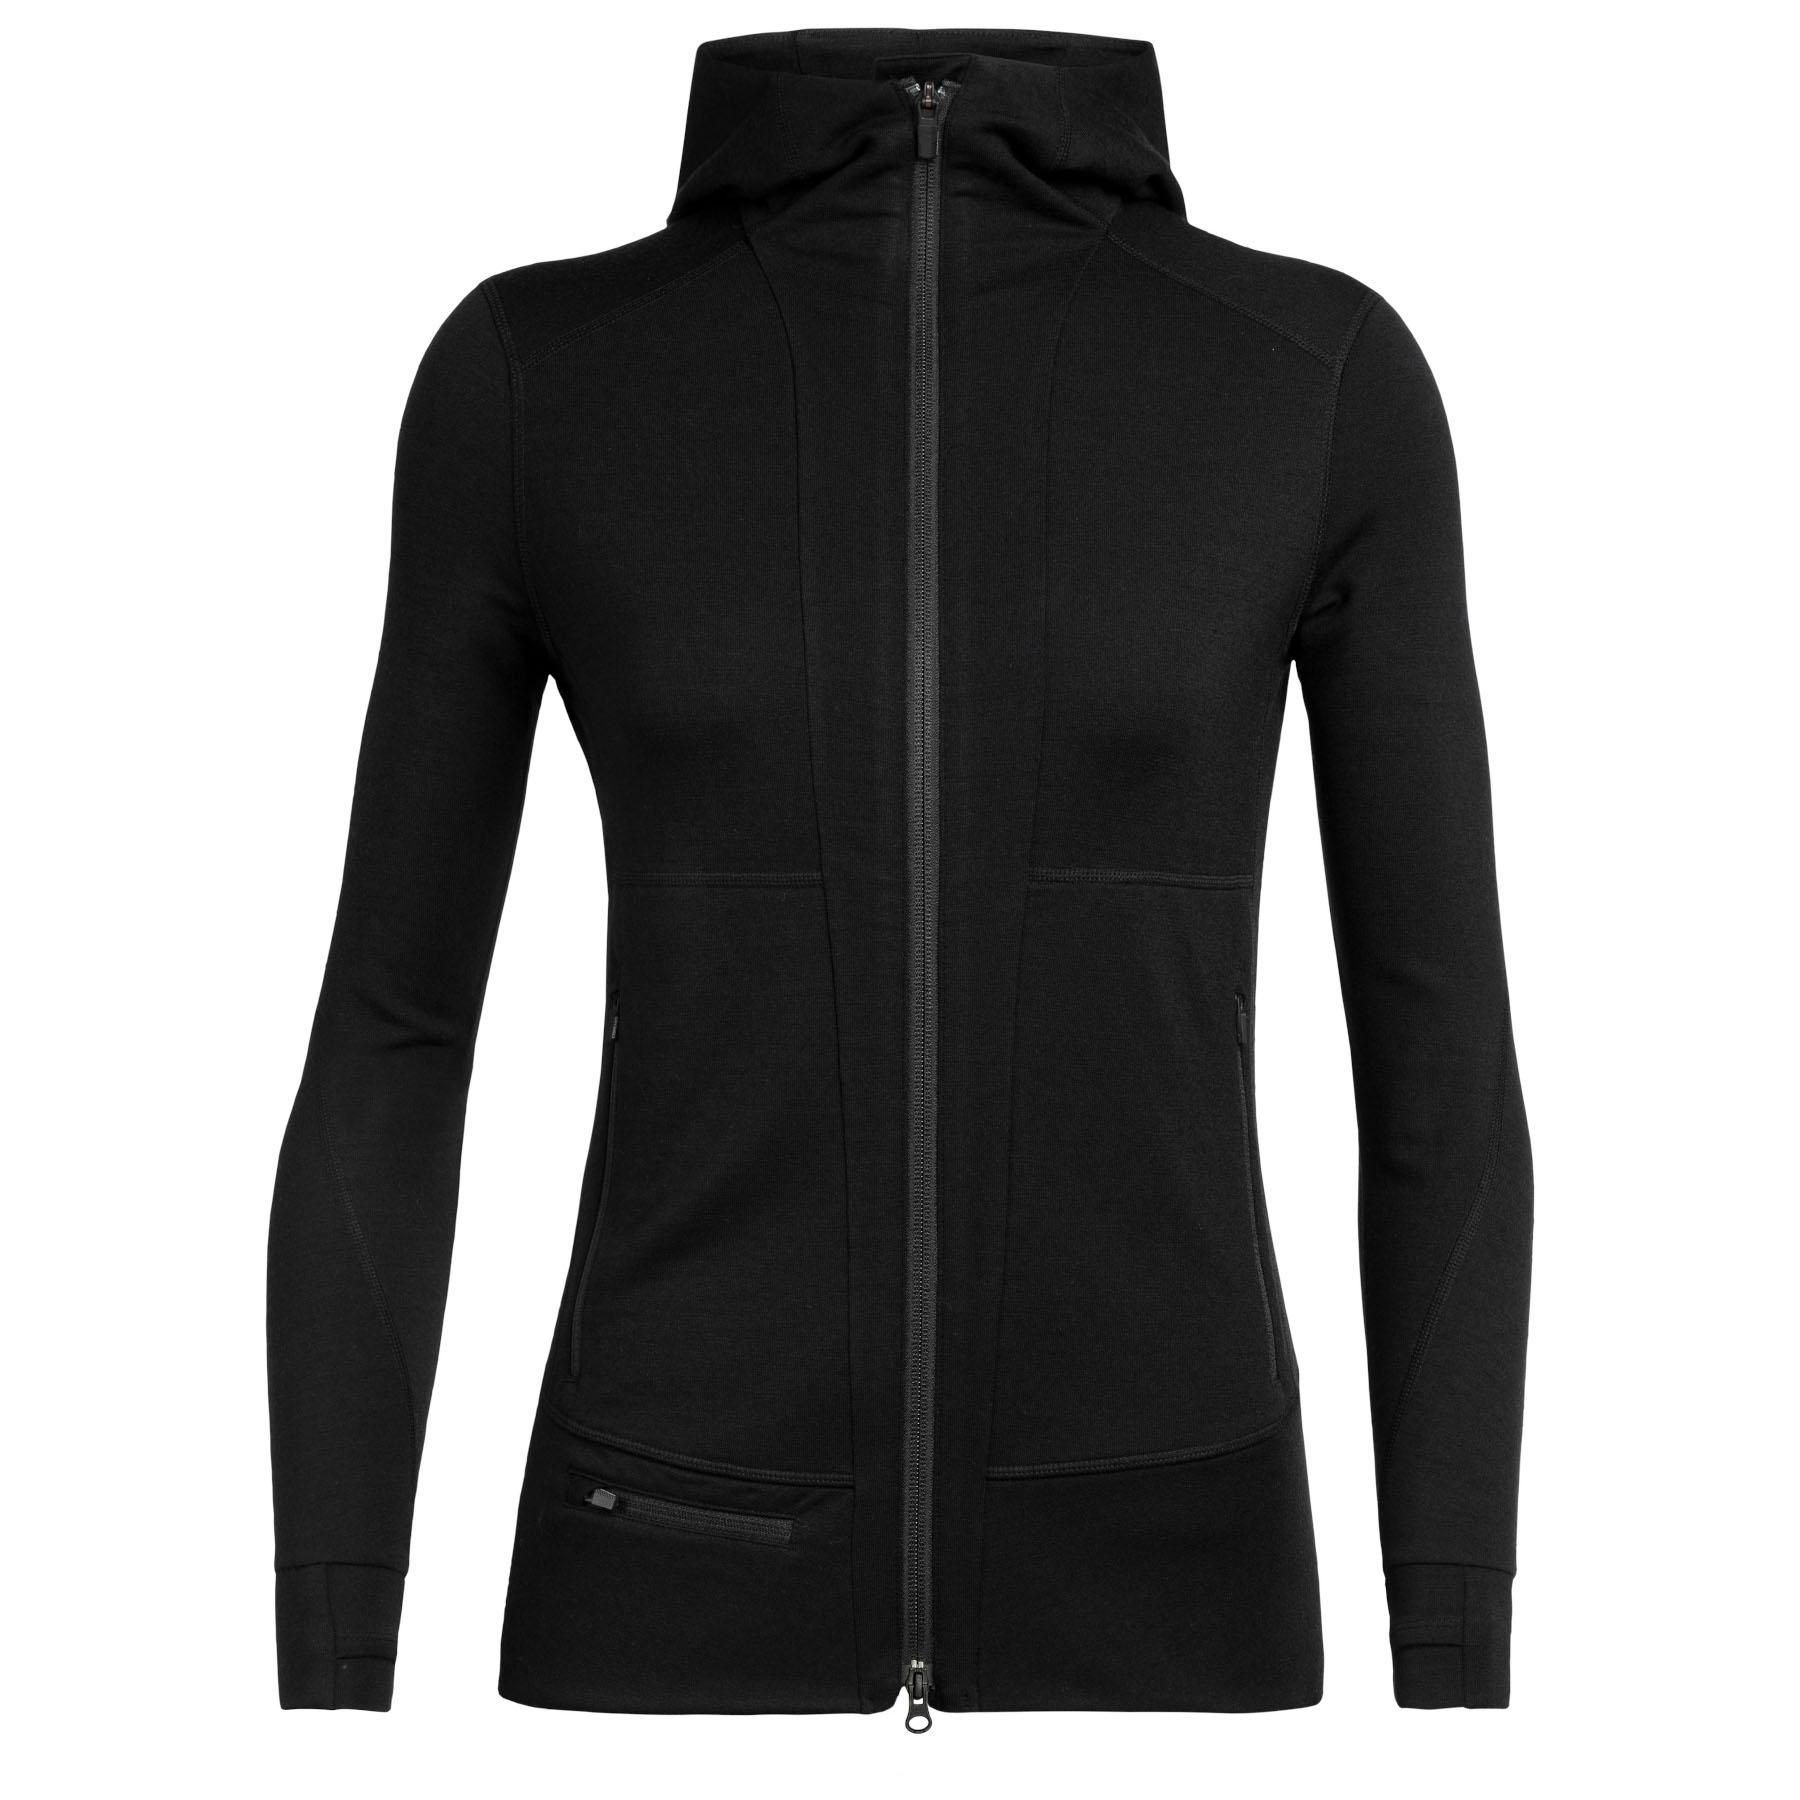 Produktbild von Icebreaker Quantum II Zip Hood Damen Kapuzenjacke - Black